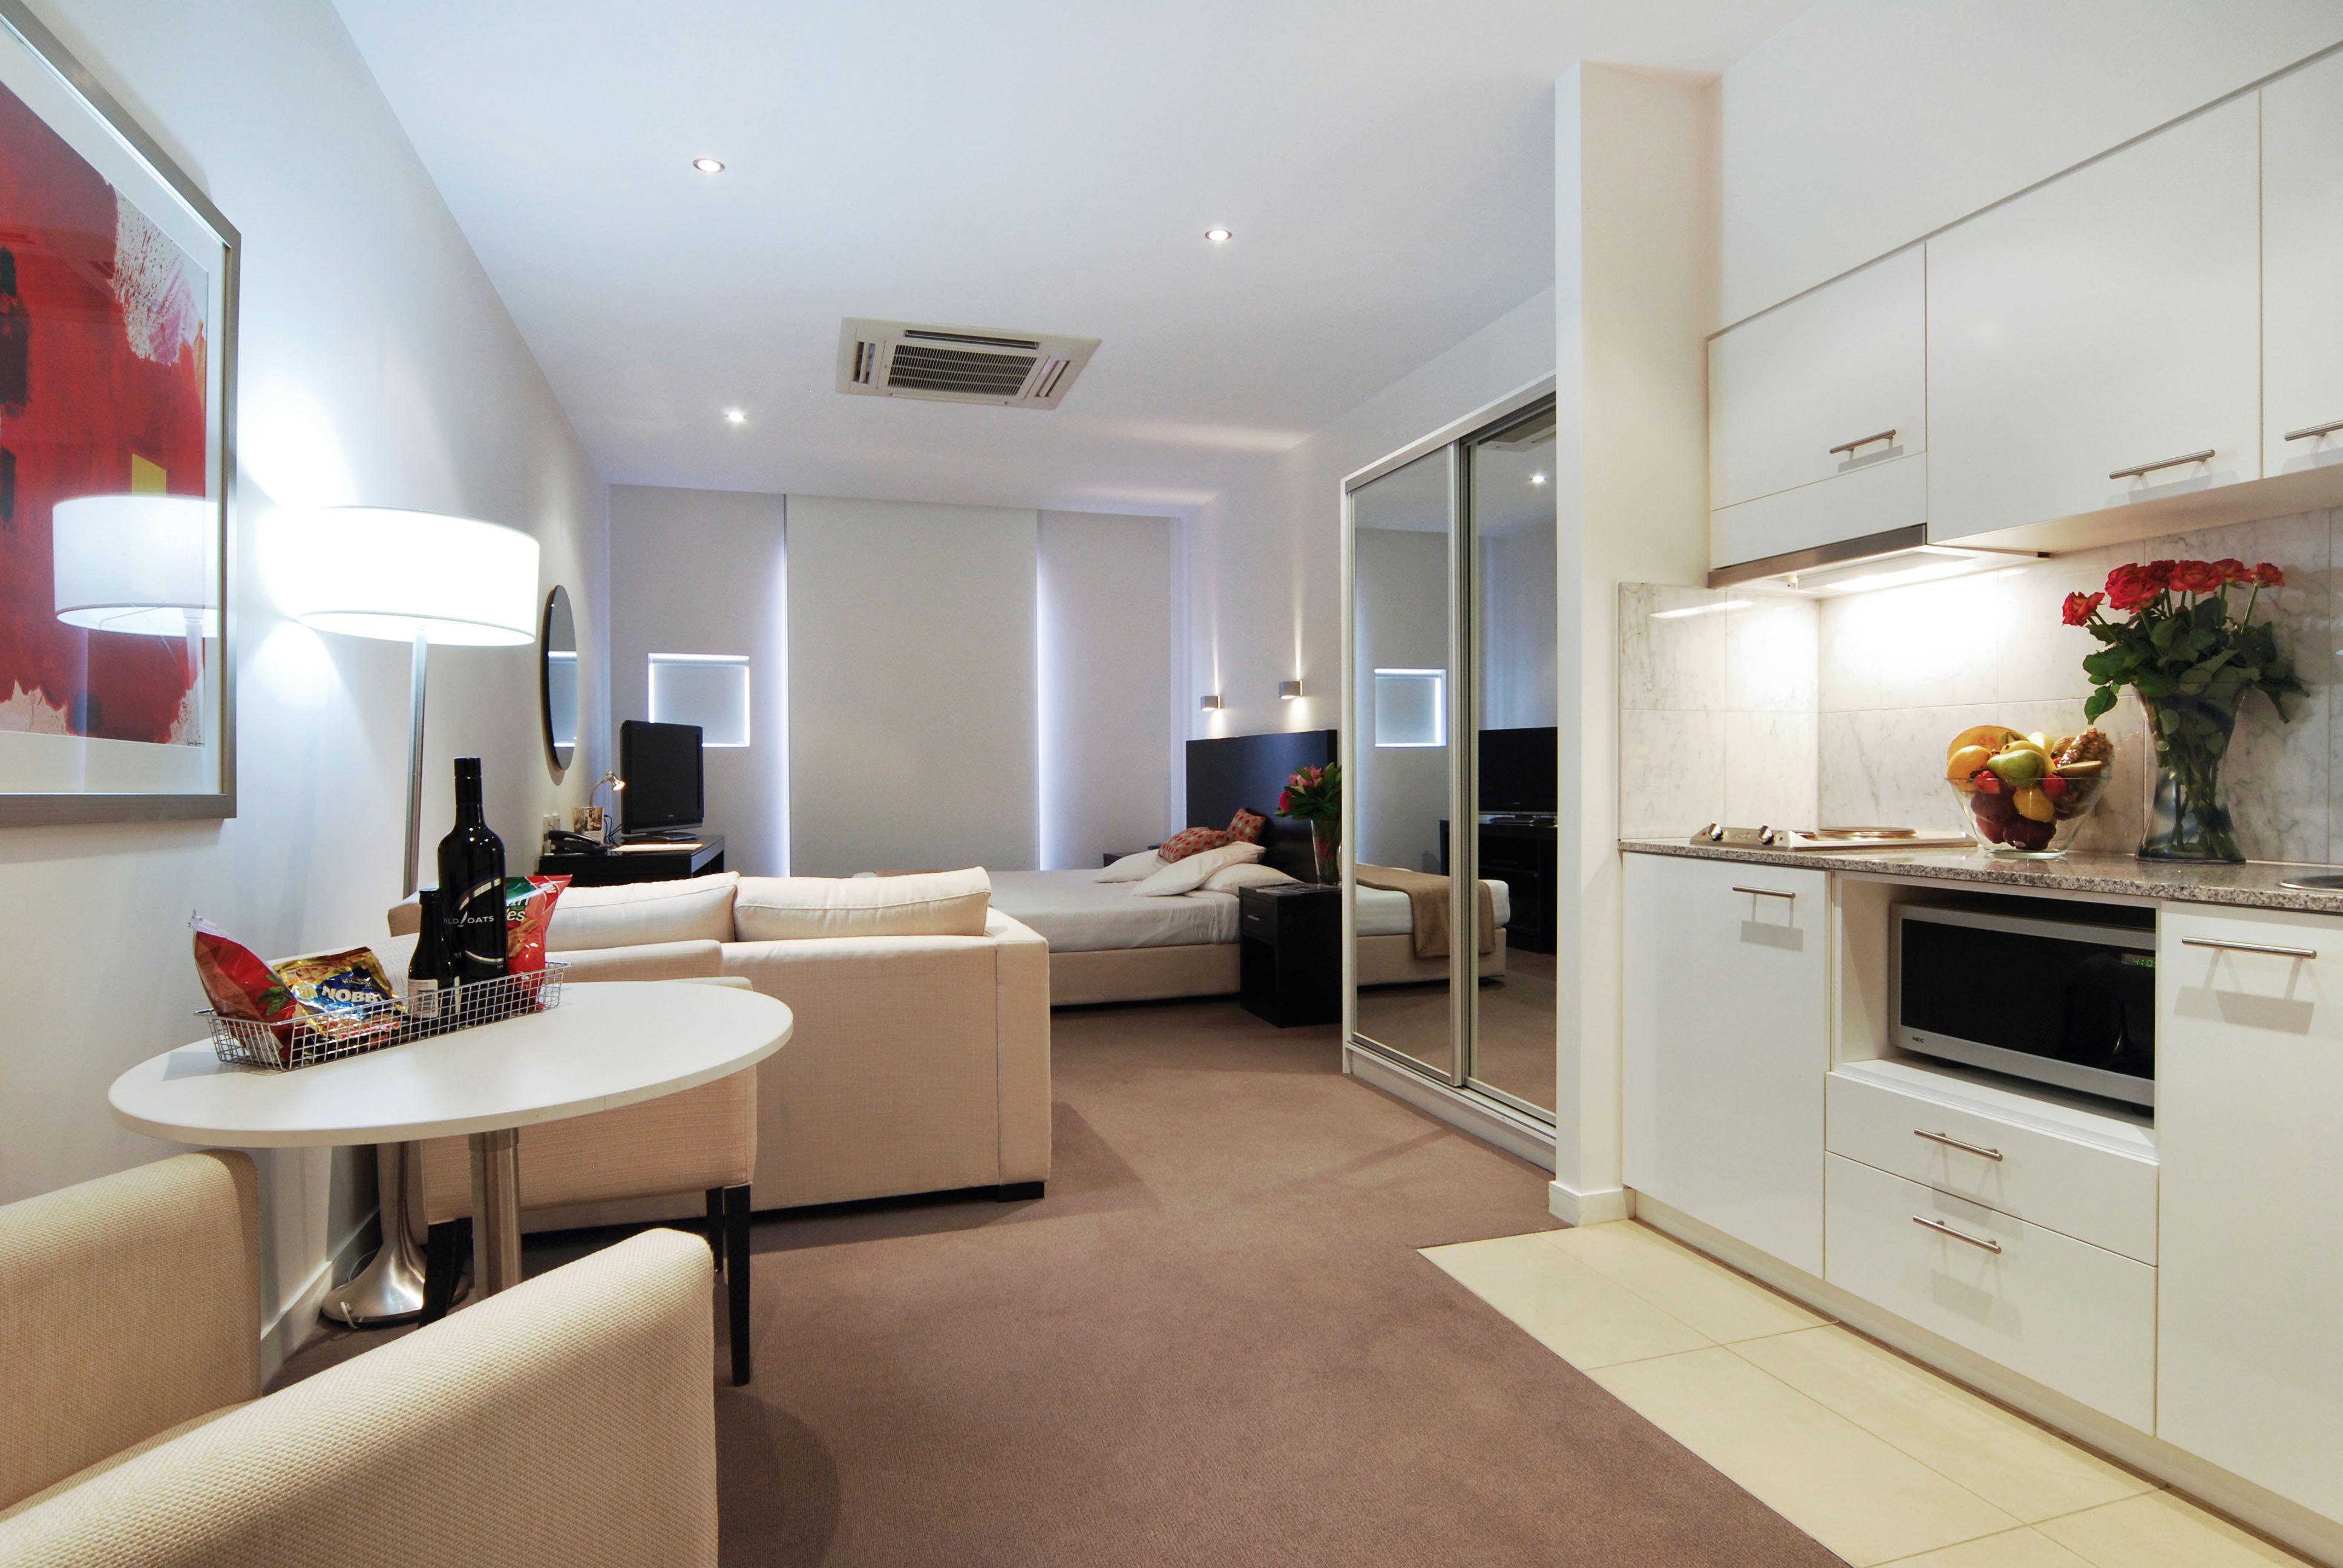 Gurgaon Interiors Designers Interior Designer Is A Top And Reliable Design Firm Primarily Based